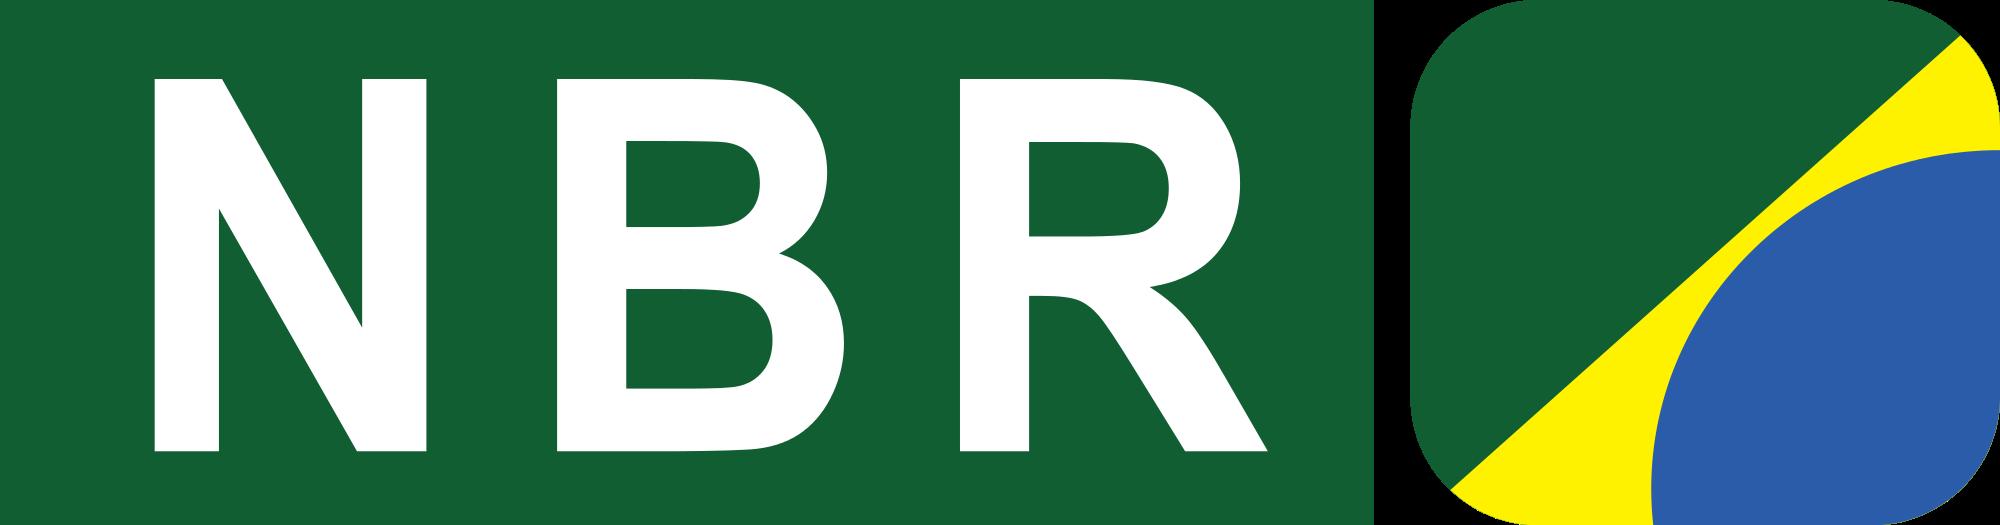 Distrito Federal - NBR (DF)